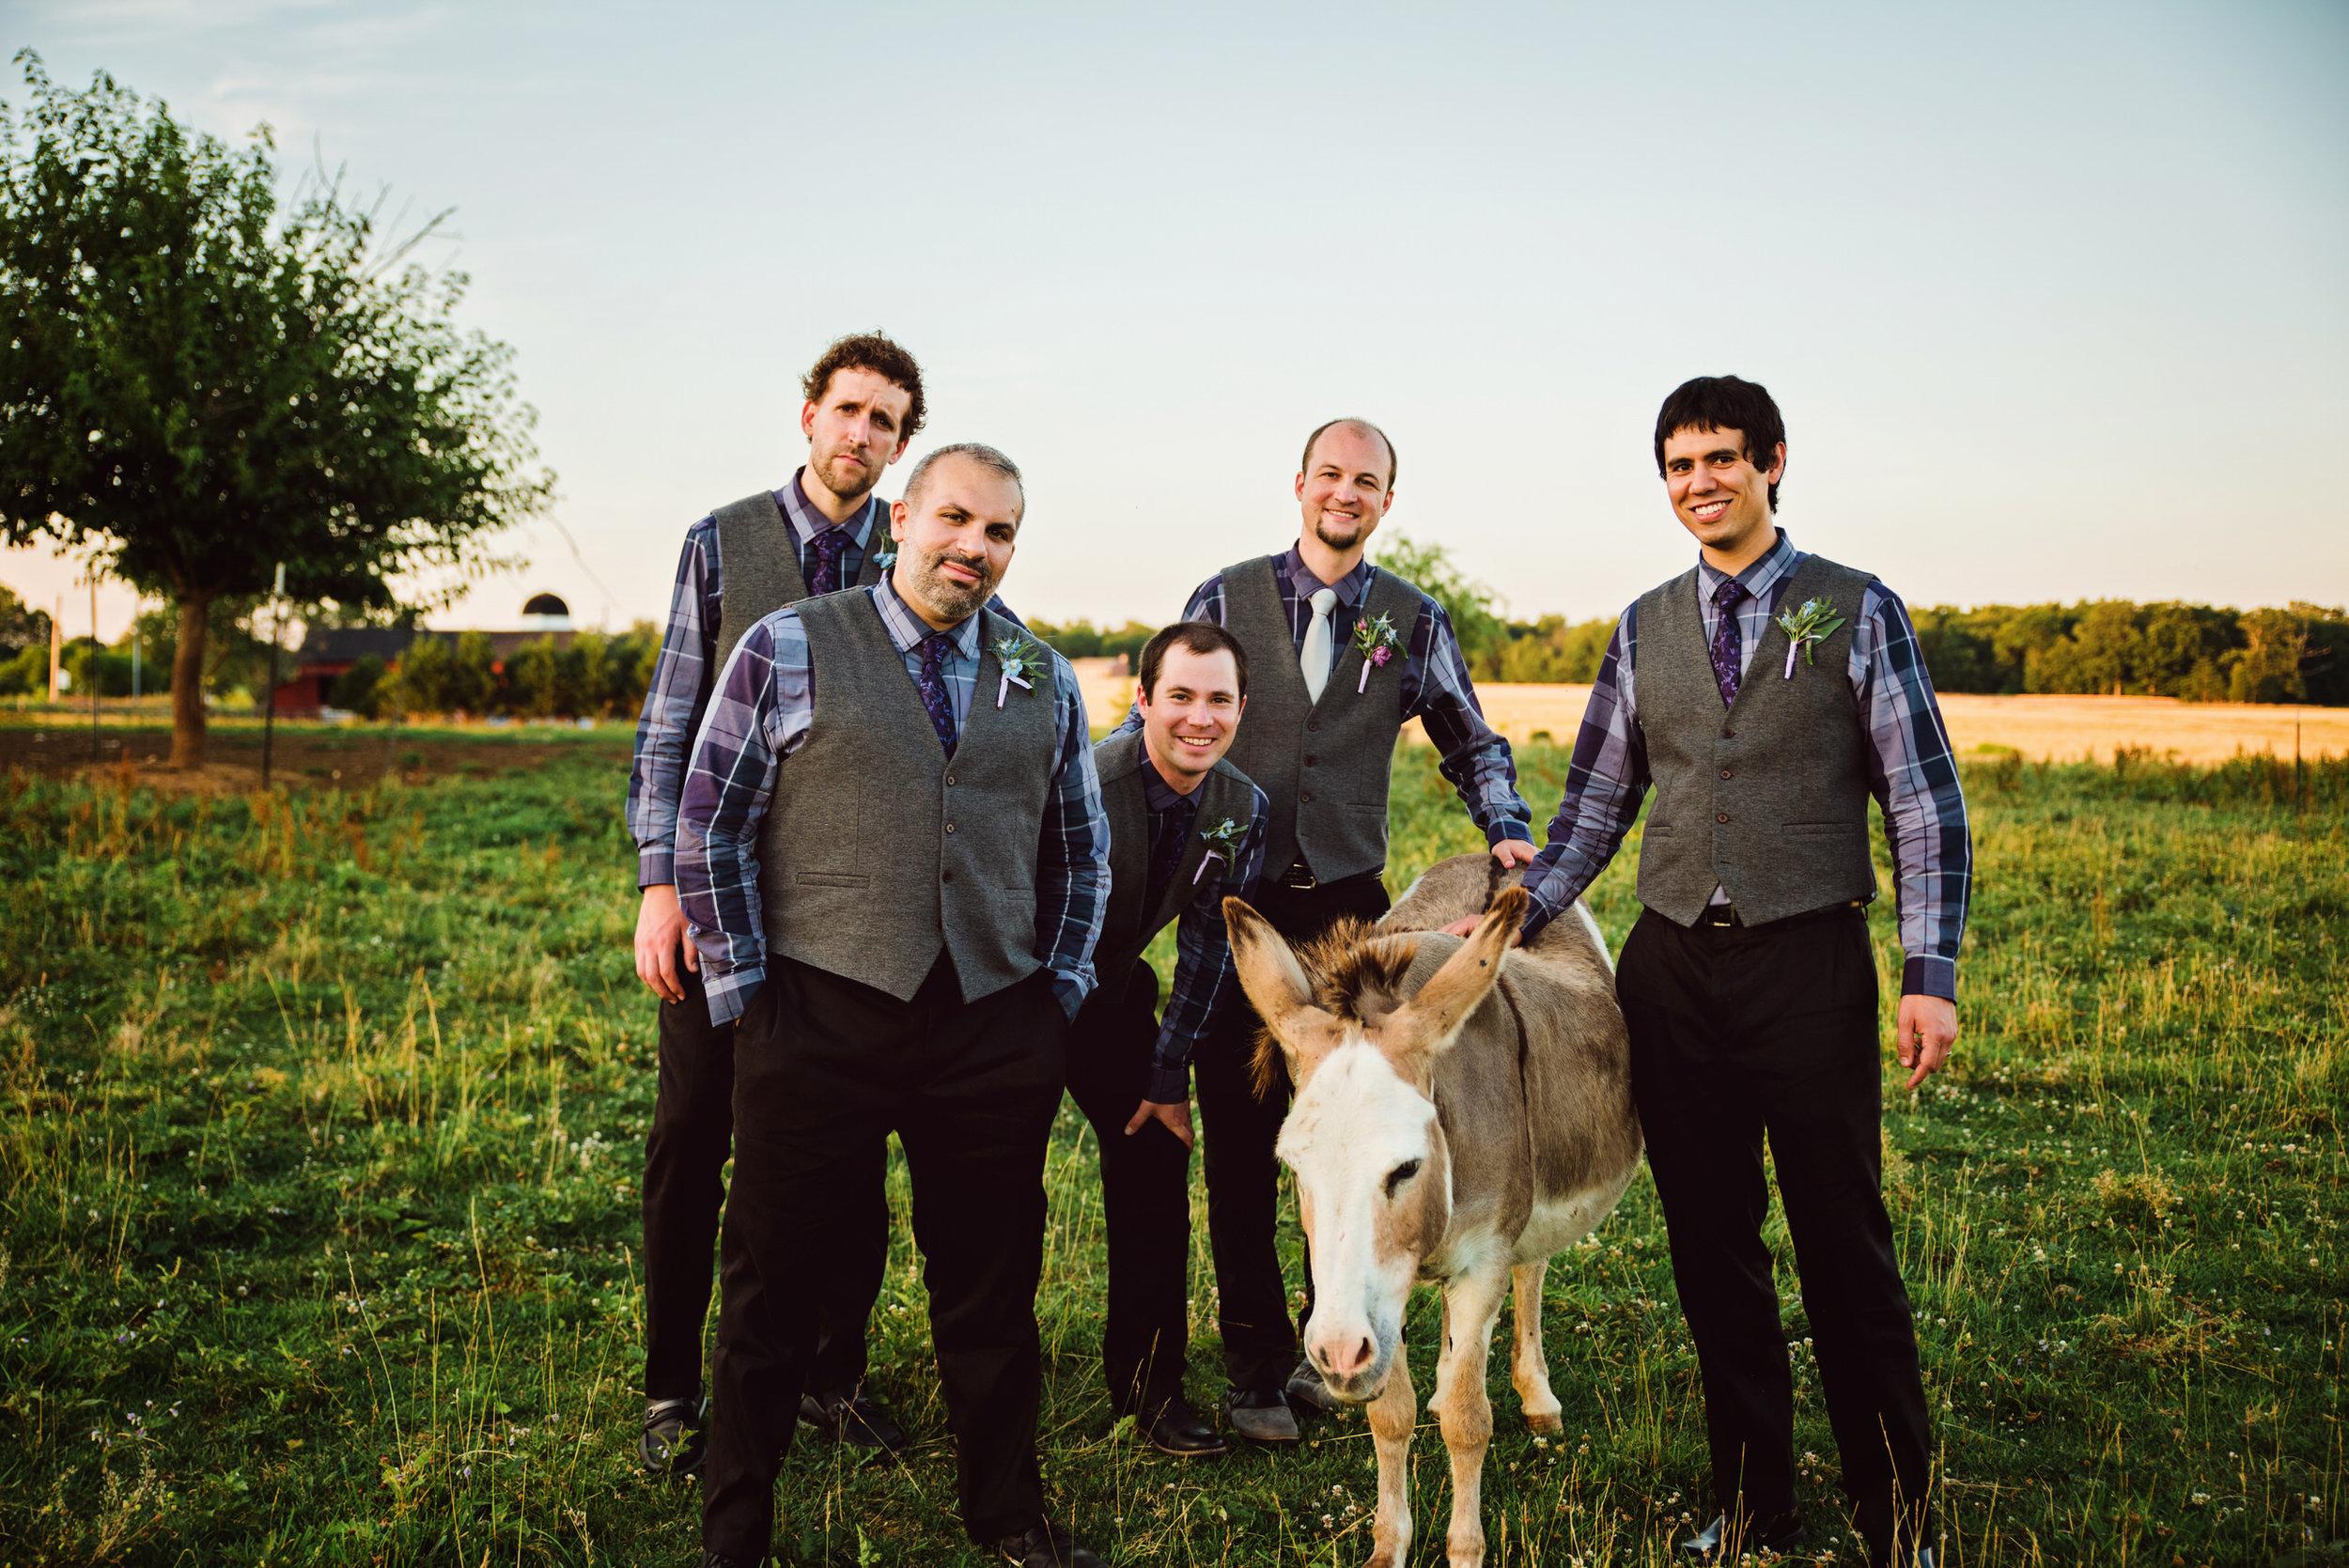 EastLynnFarmWedding-Steph&Aaron-Family-WP-273.jpg